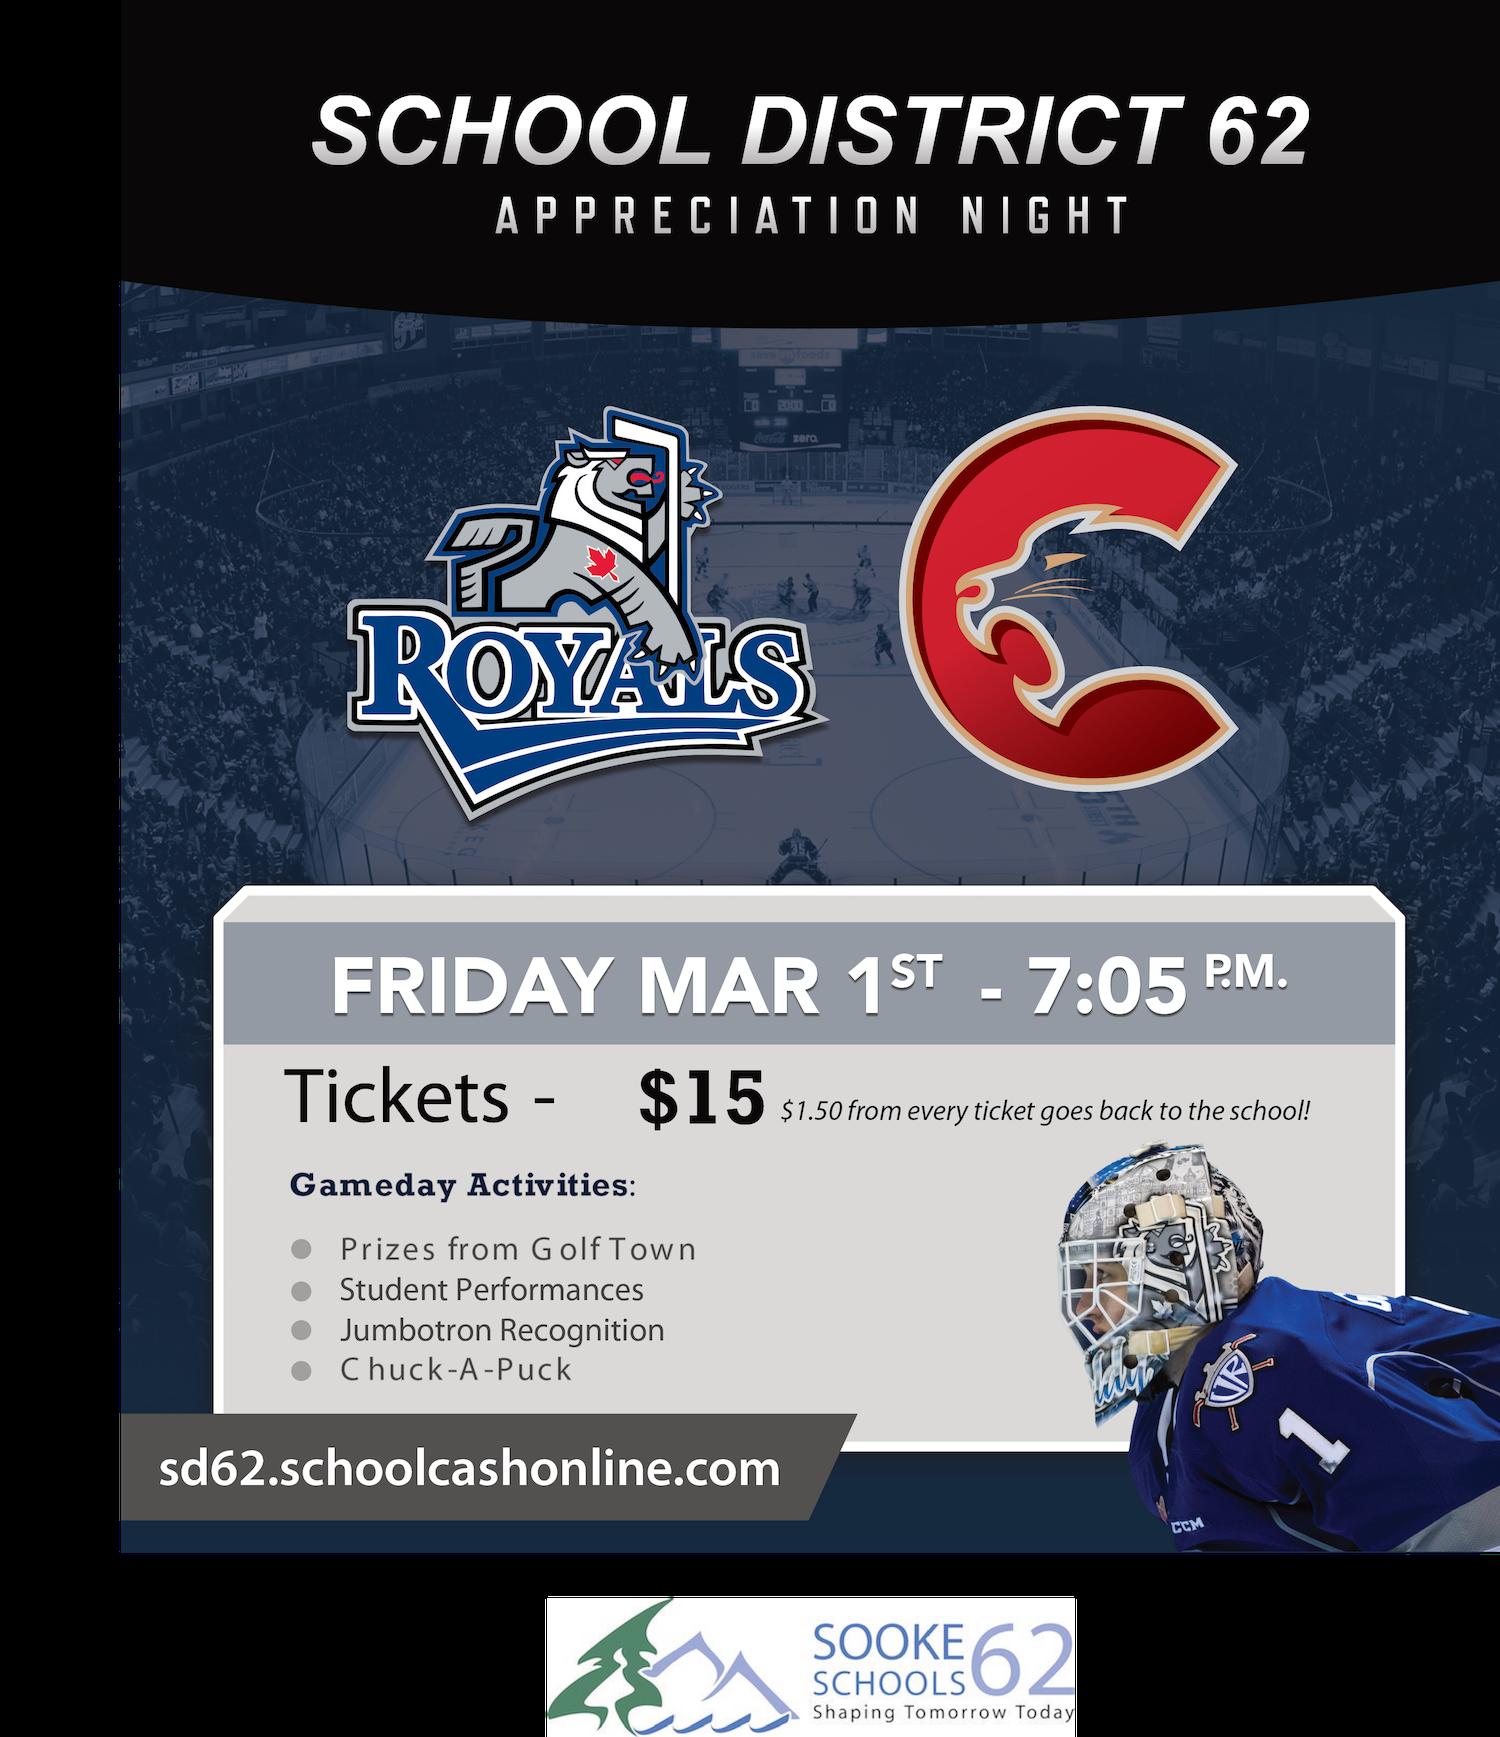 Poster feature school dirstict logo and Victoria Royals hockey team logo